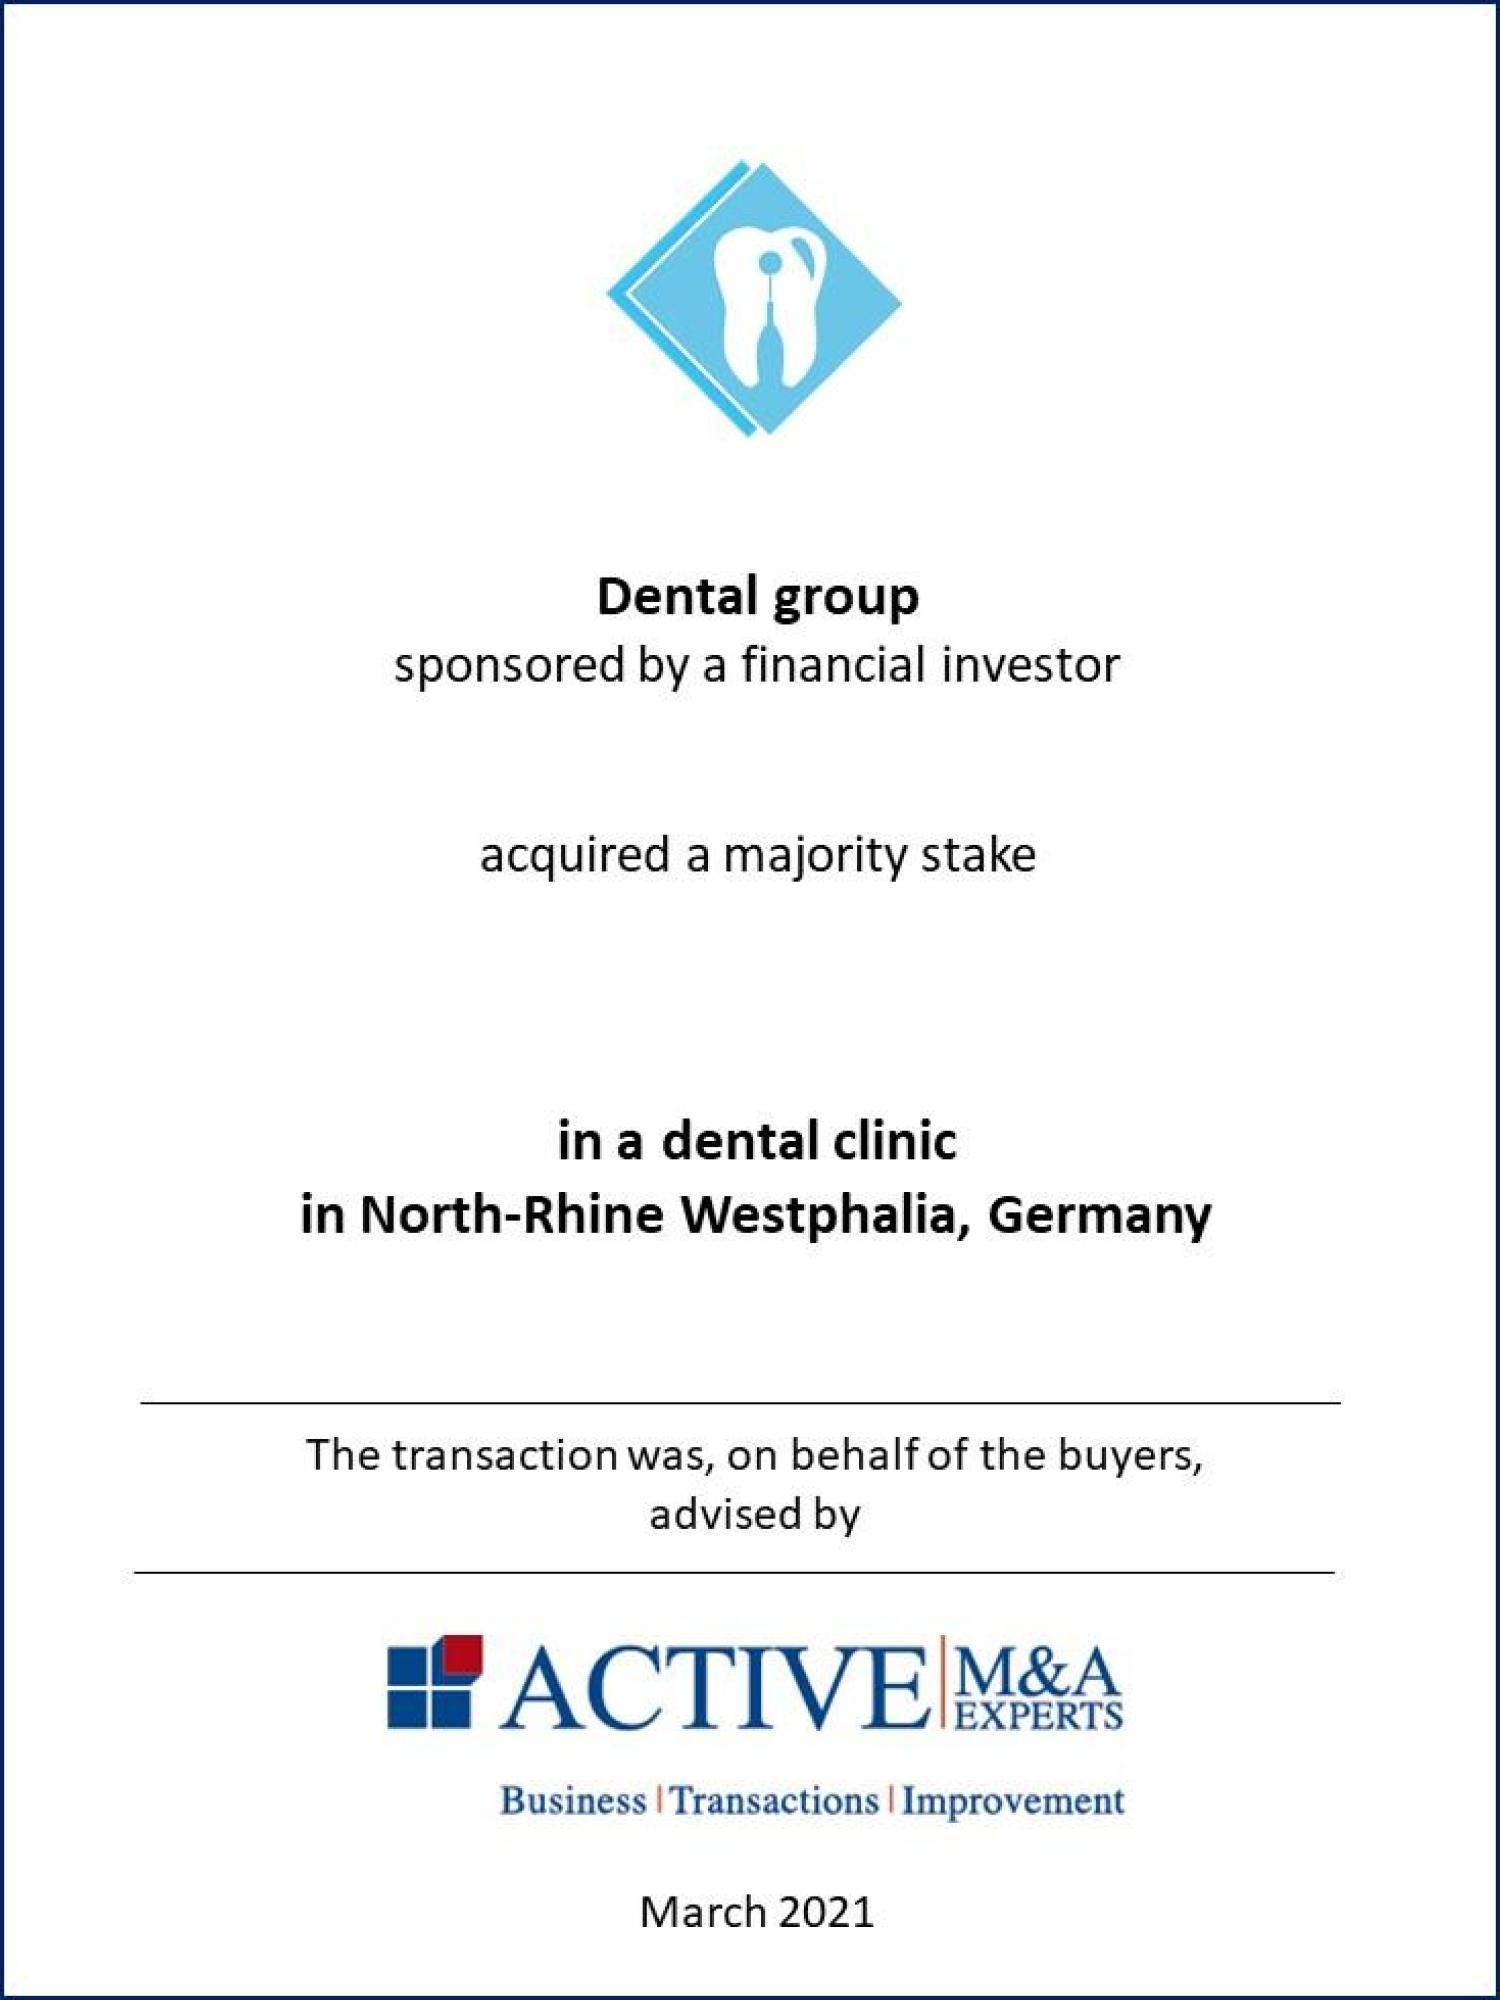 Zahnarzt-Gruppe kauft Zahnarztklinik, ACTIVE-Beratung